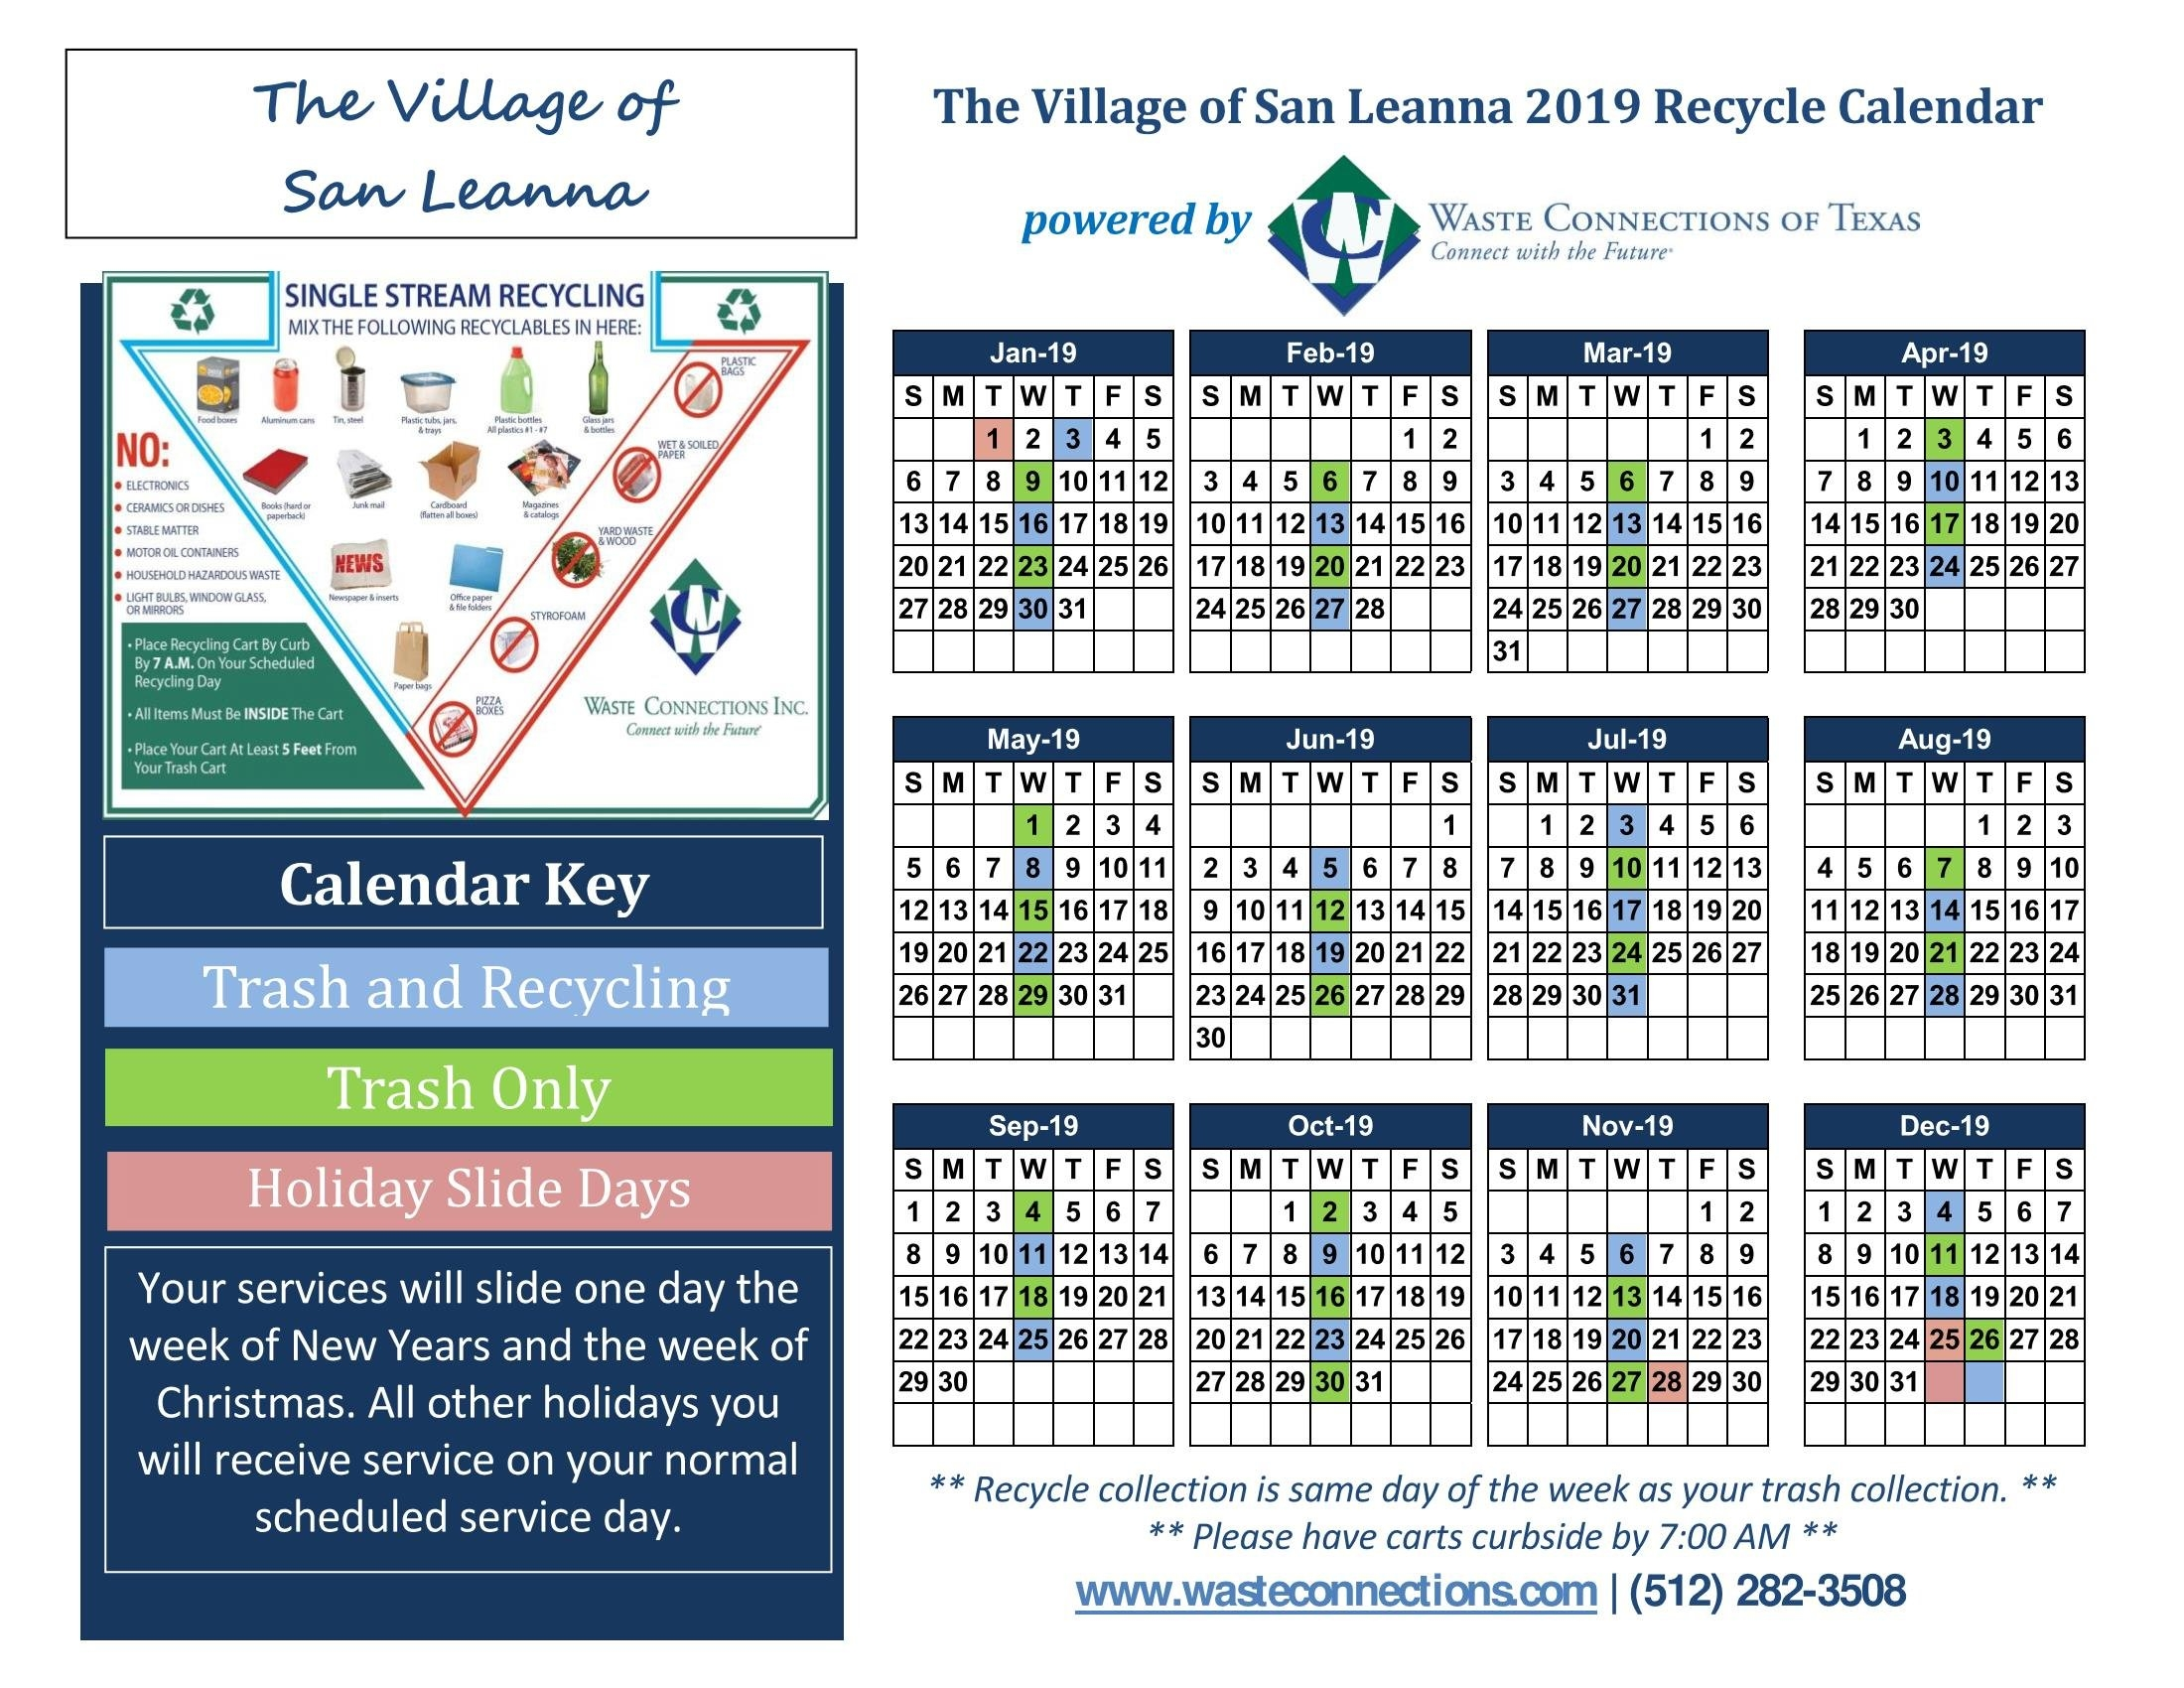 Trash And Recycling Calendar 2019 – Village Of San Leanna Calendar 2019 Same As